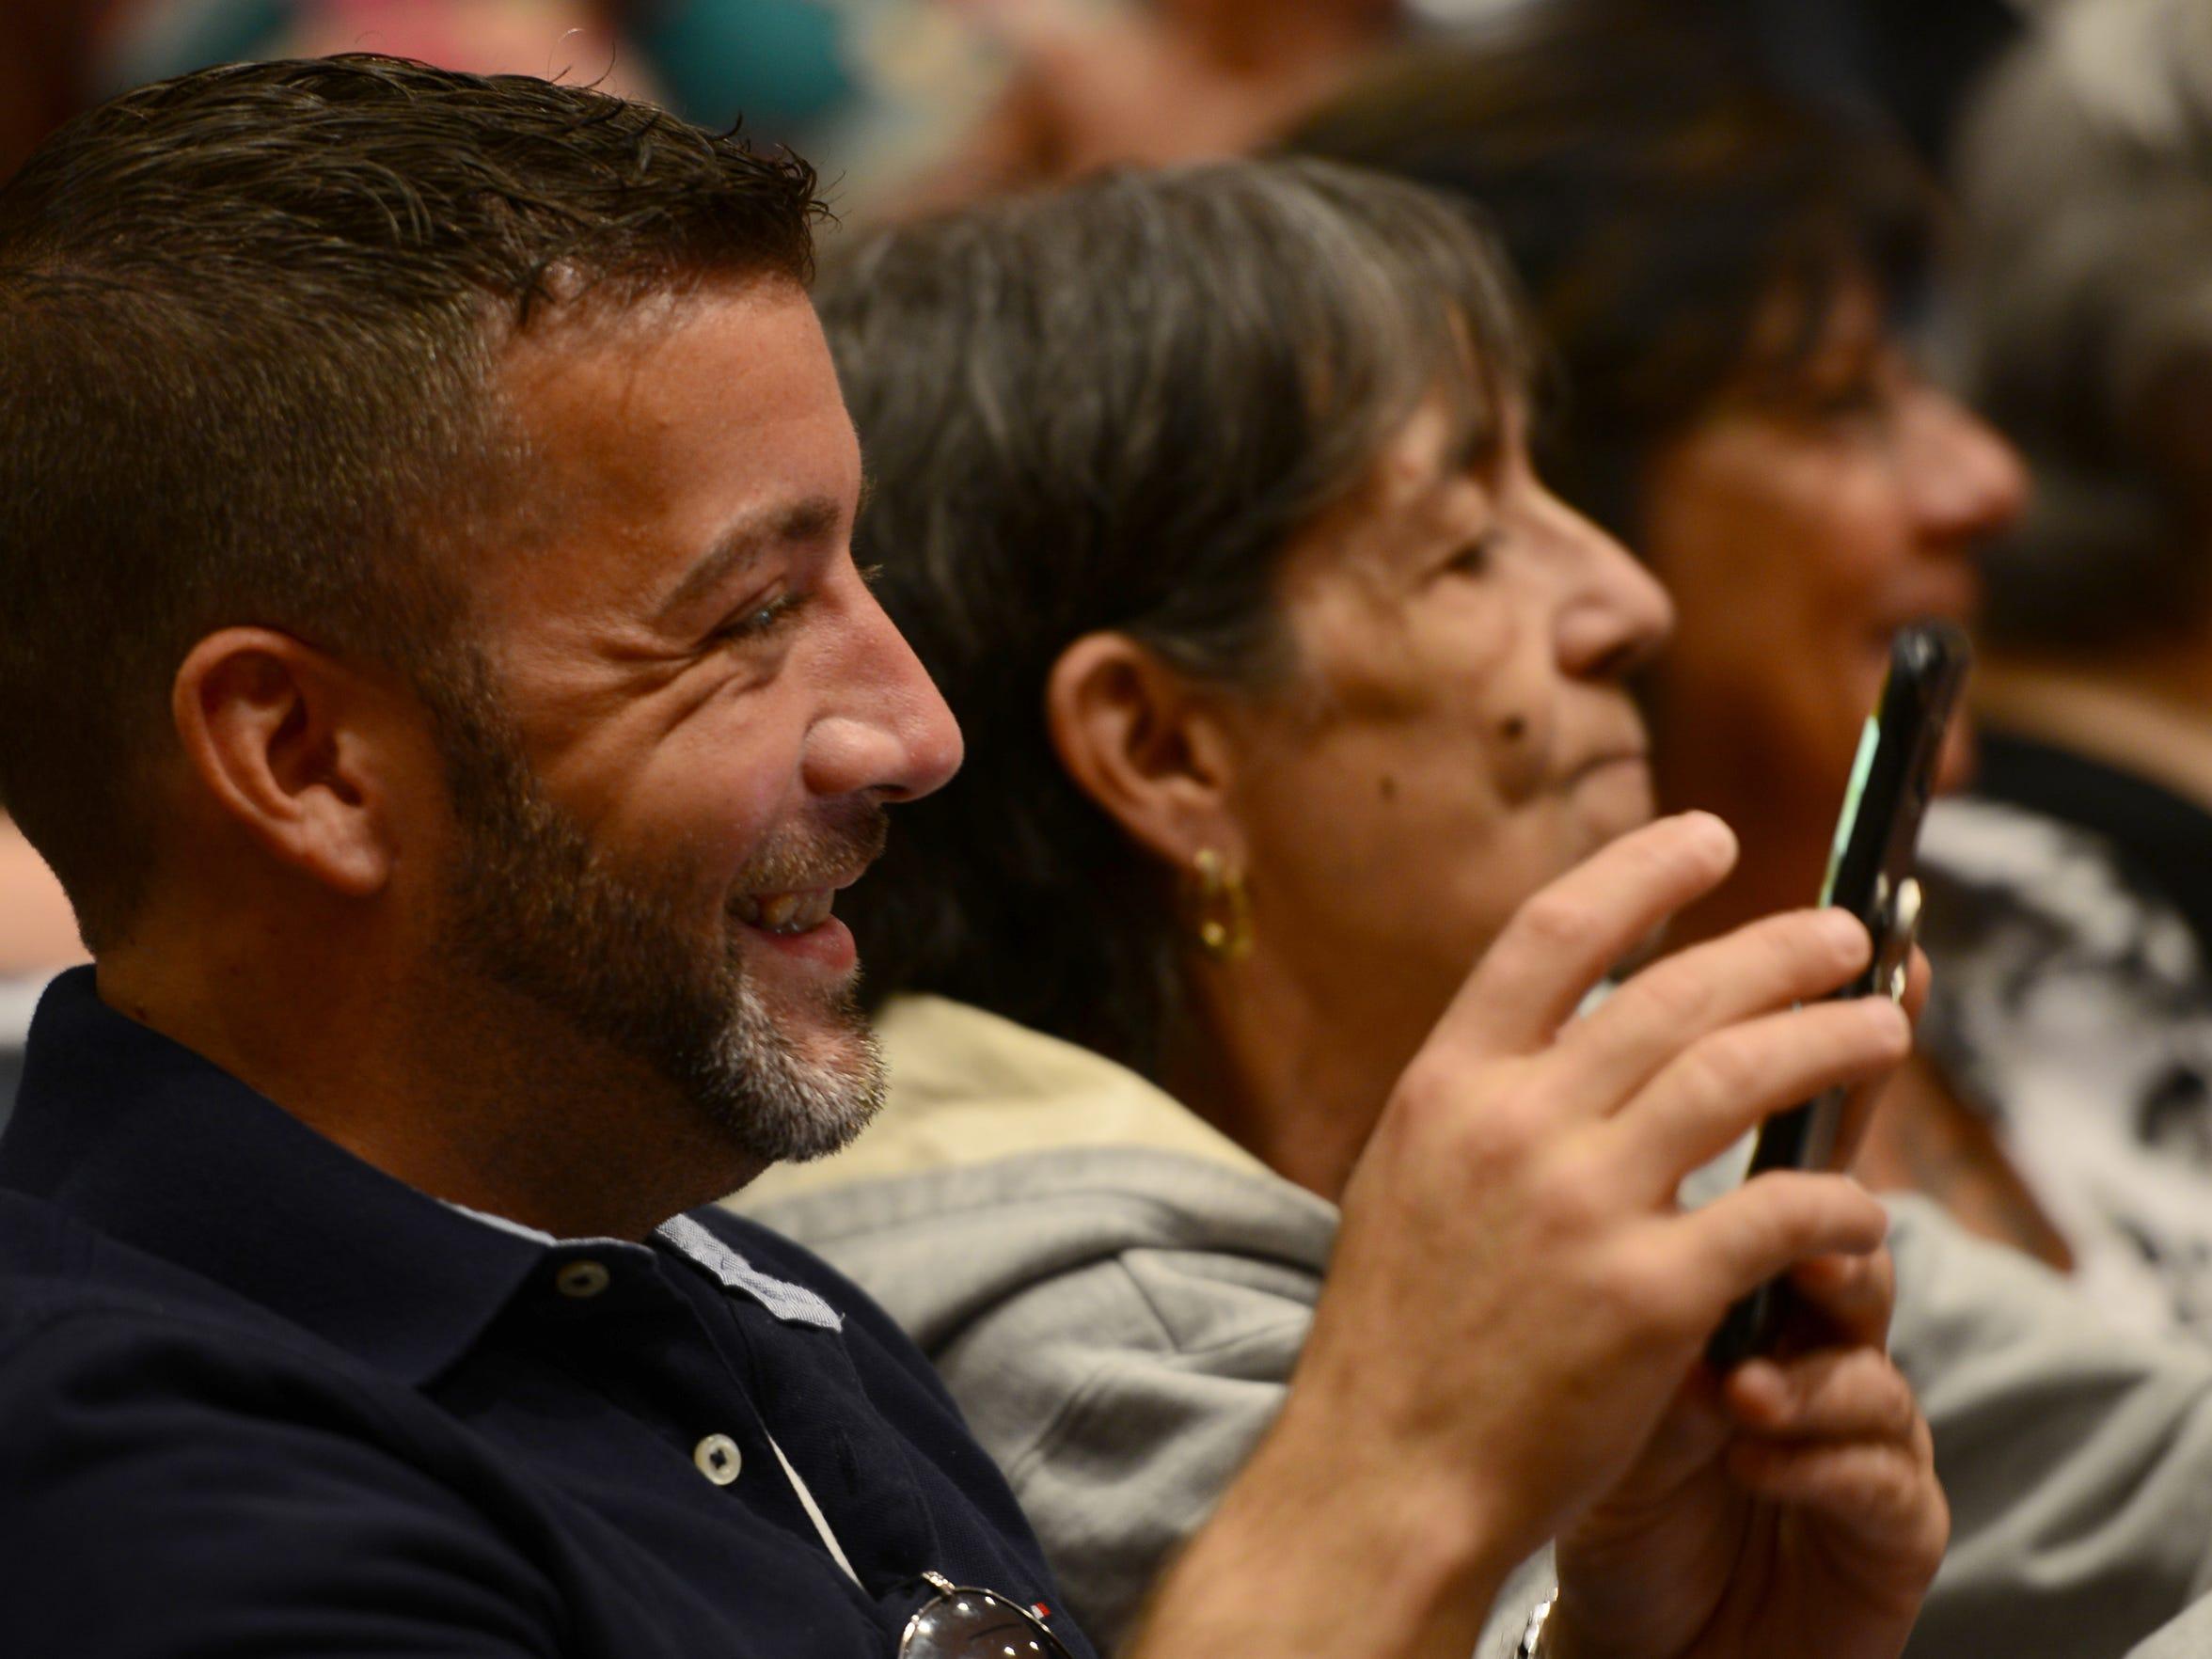 Kevin Garrett takes a photo of his fiancée, Amanda